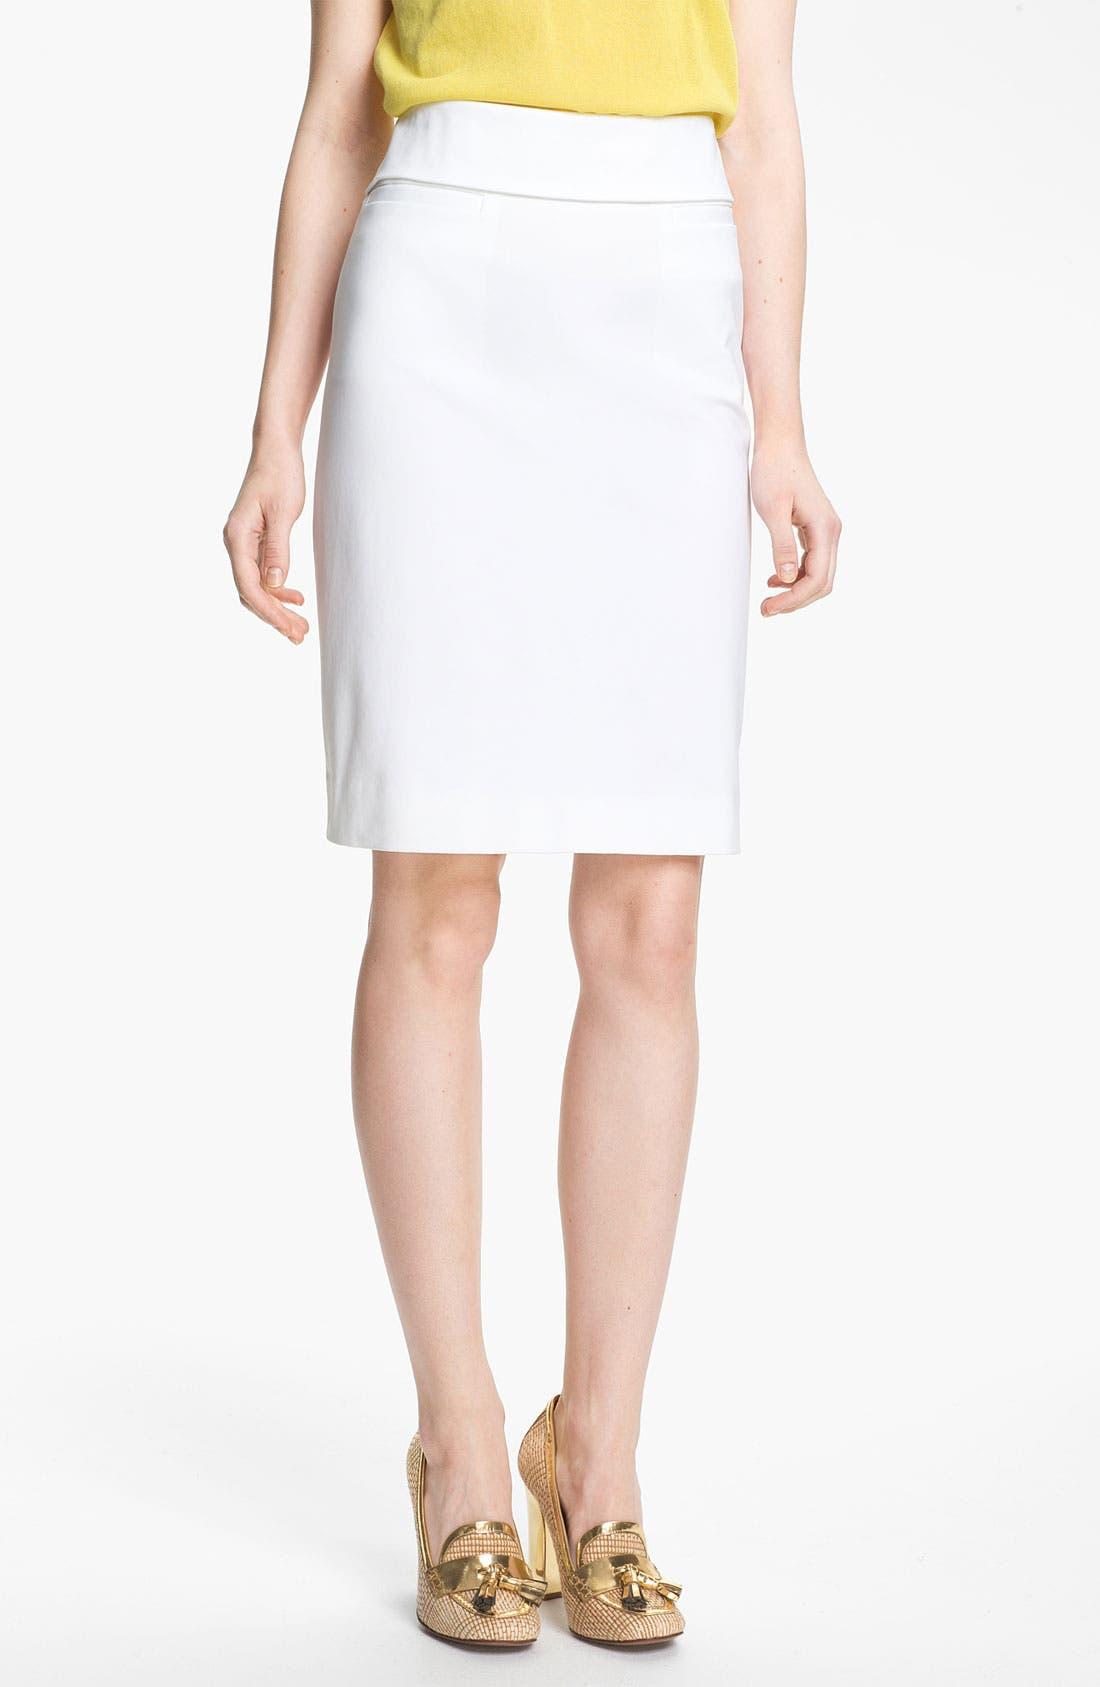 Alternate Image 1 Selected - Tory Burch 'Isabella' Skirt